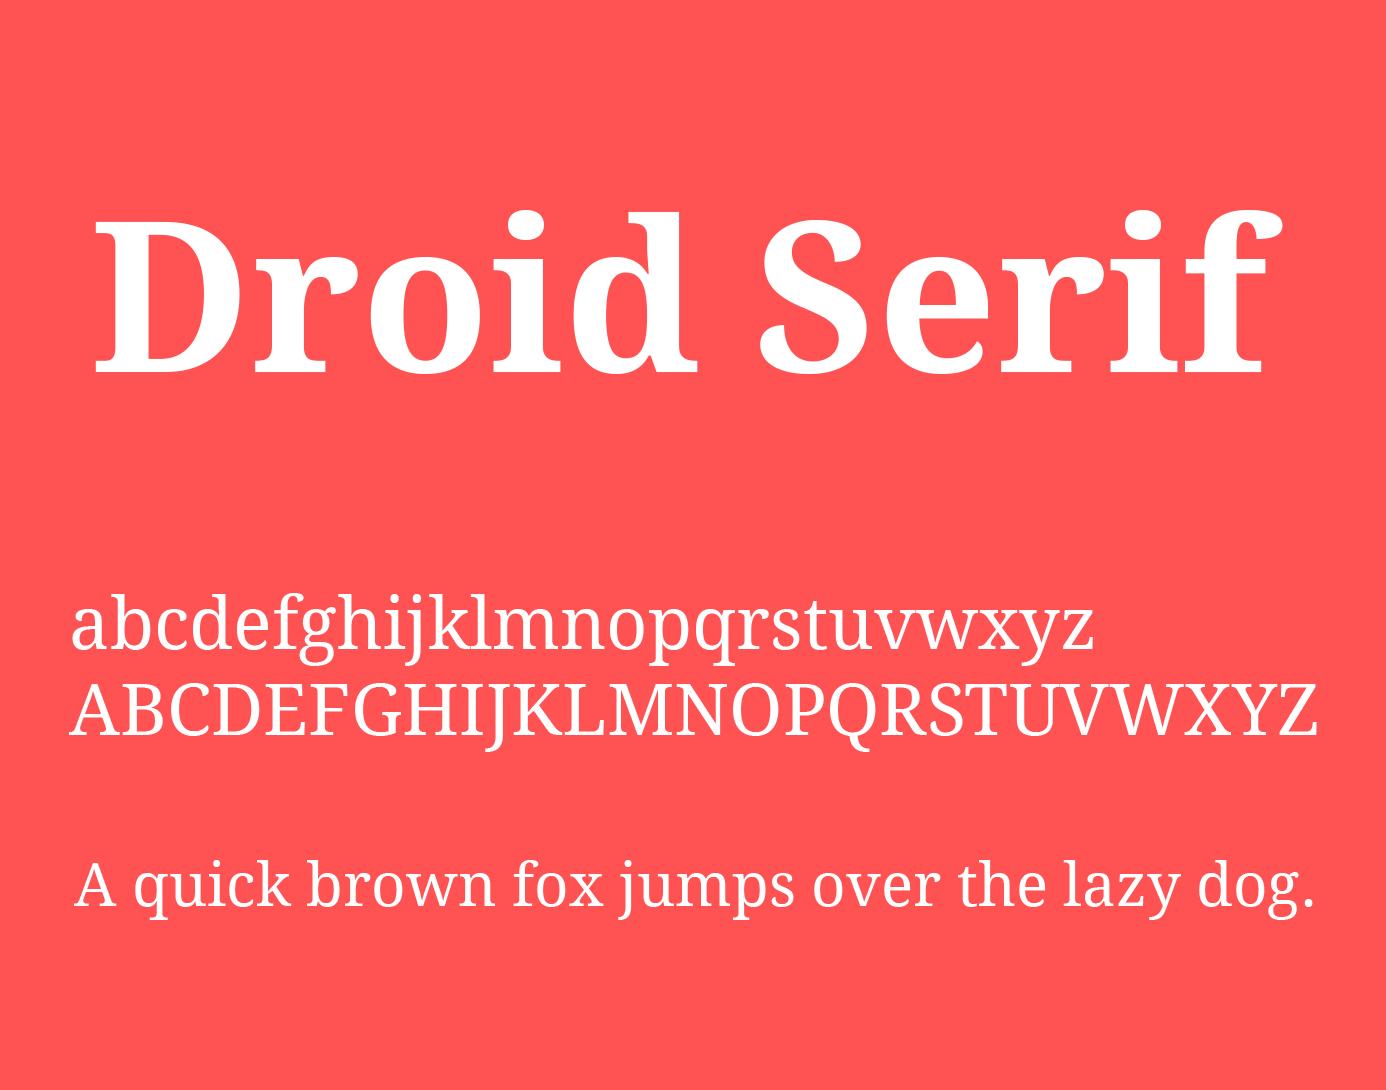 droid-serif-font